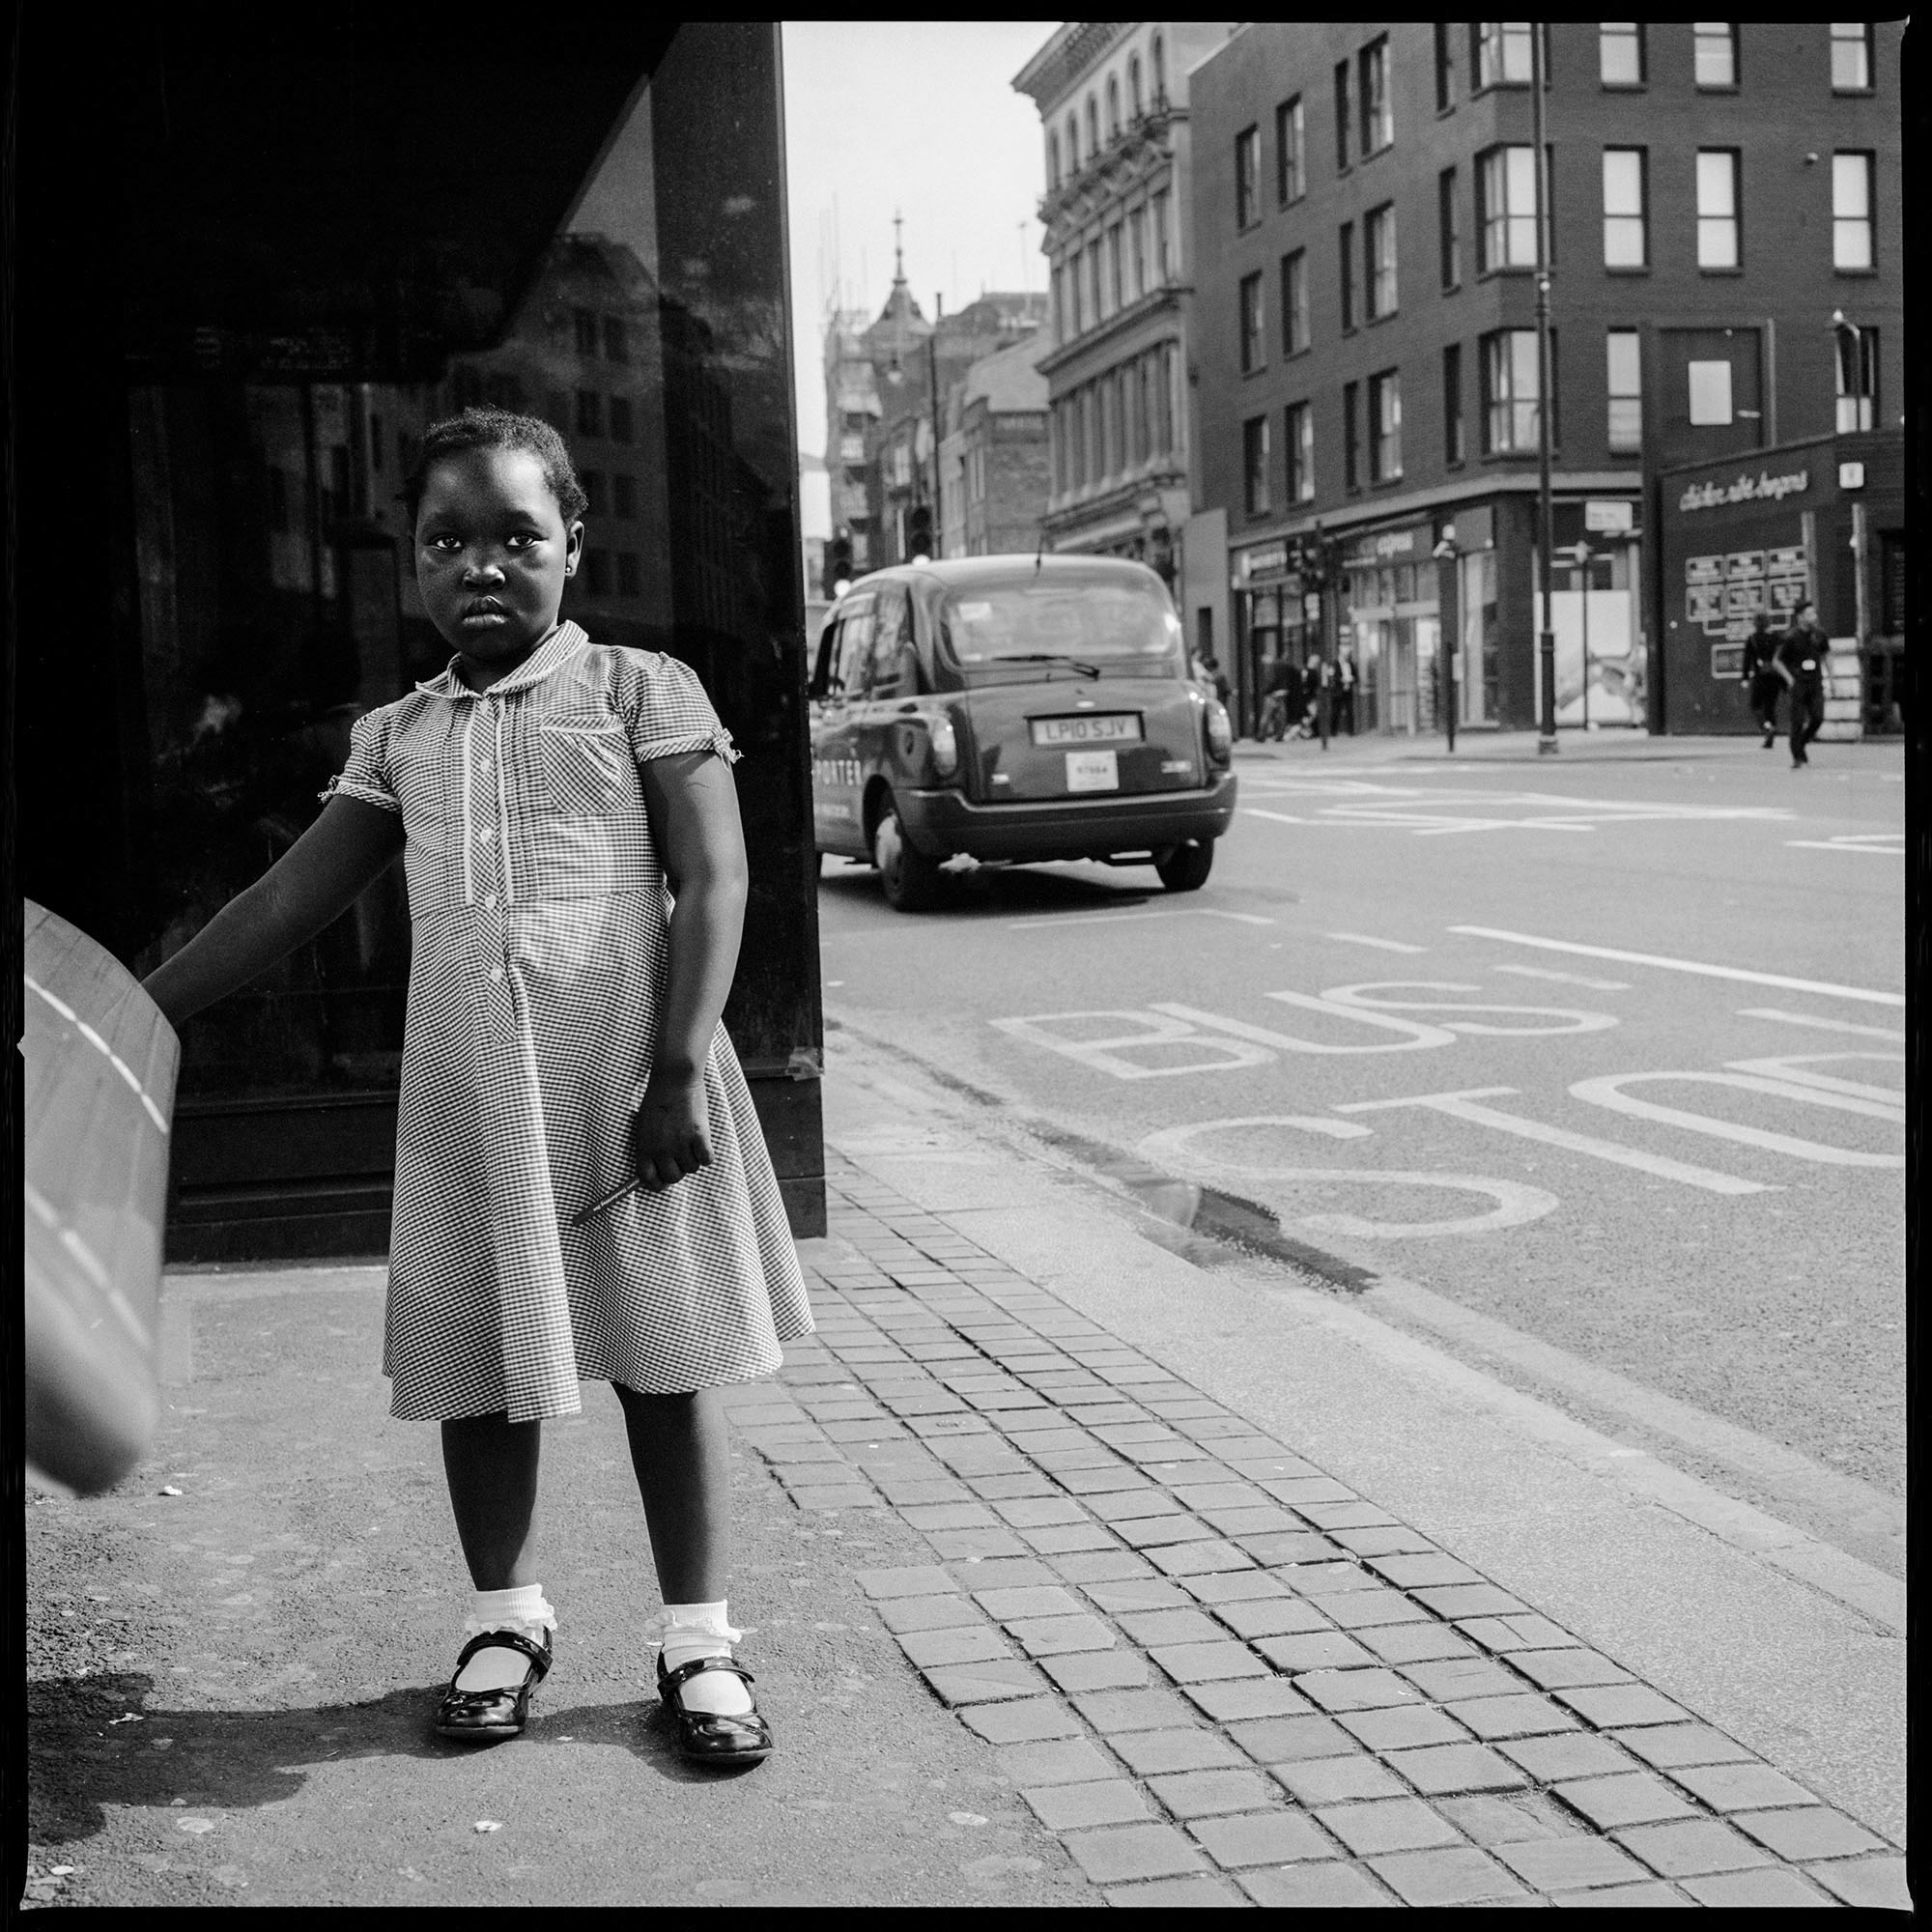 Adama Jalloh - Streets of London2